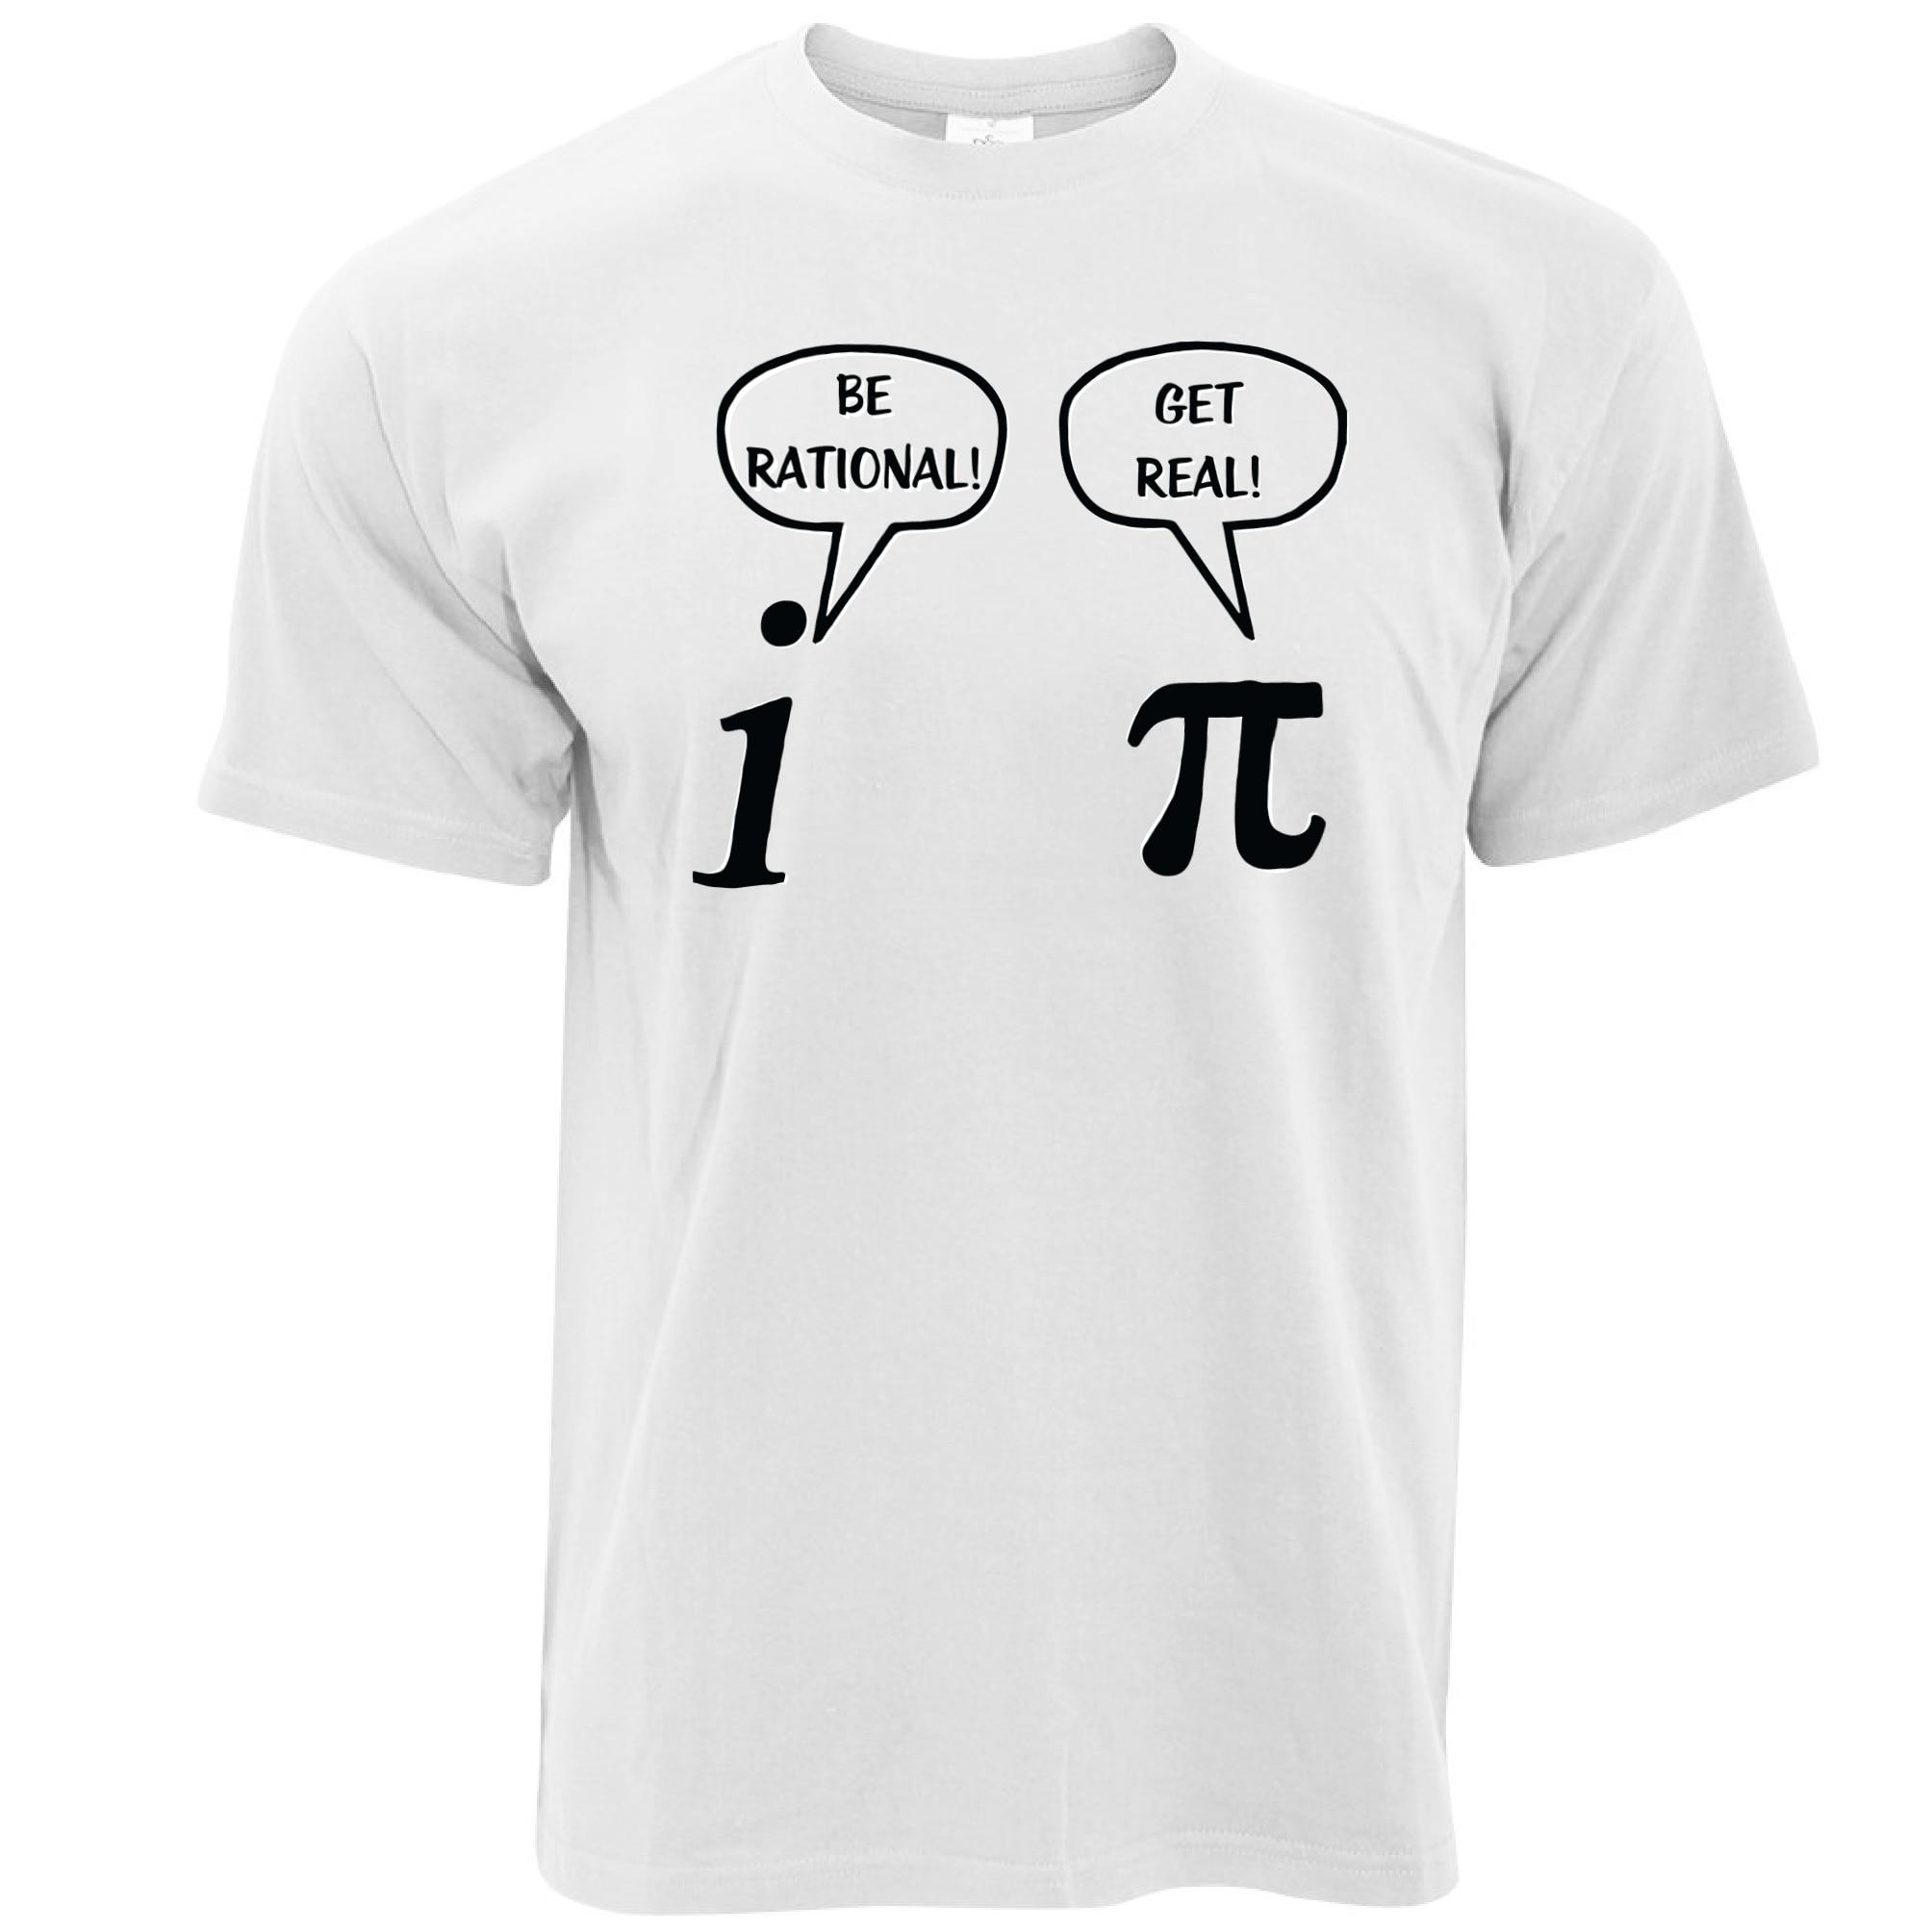 High Quality T Shirts Short Crew Neck Be Rational, Get Real! Maths Science Geeky Joke Pun Pi Best Friend Mens Shirts